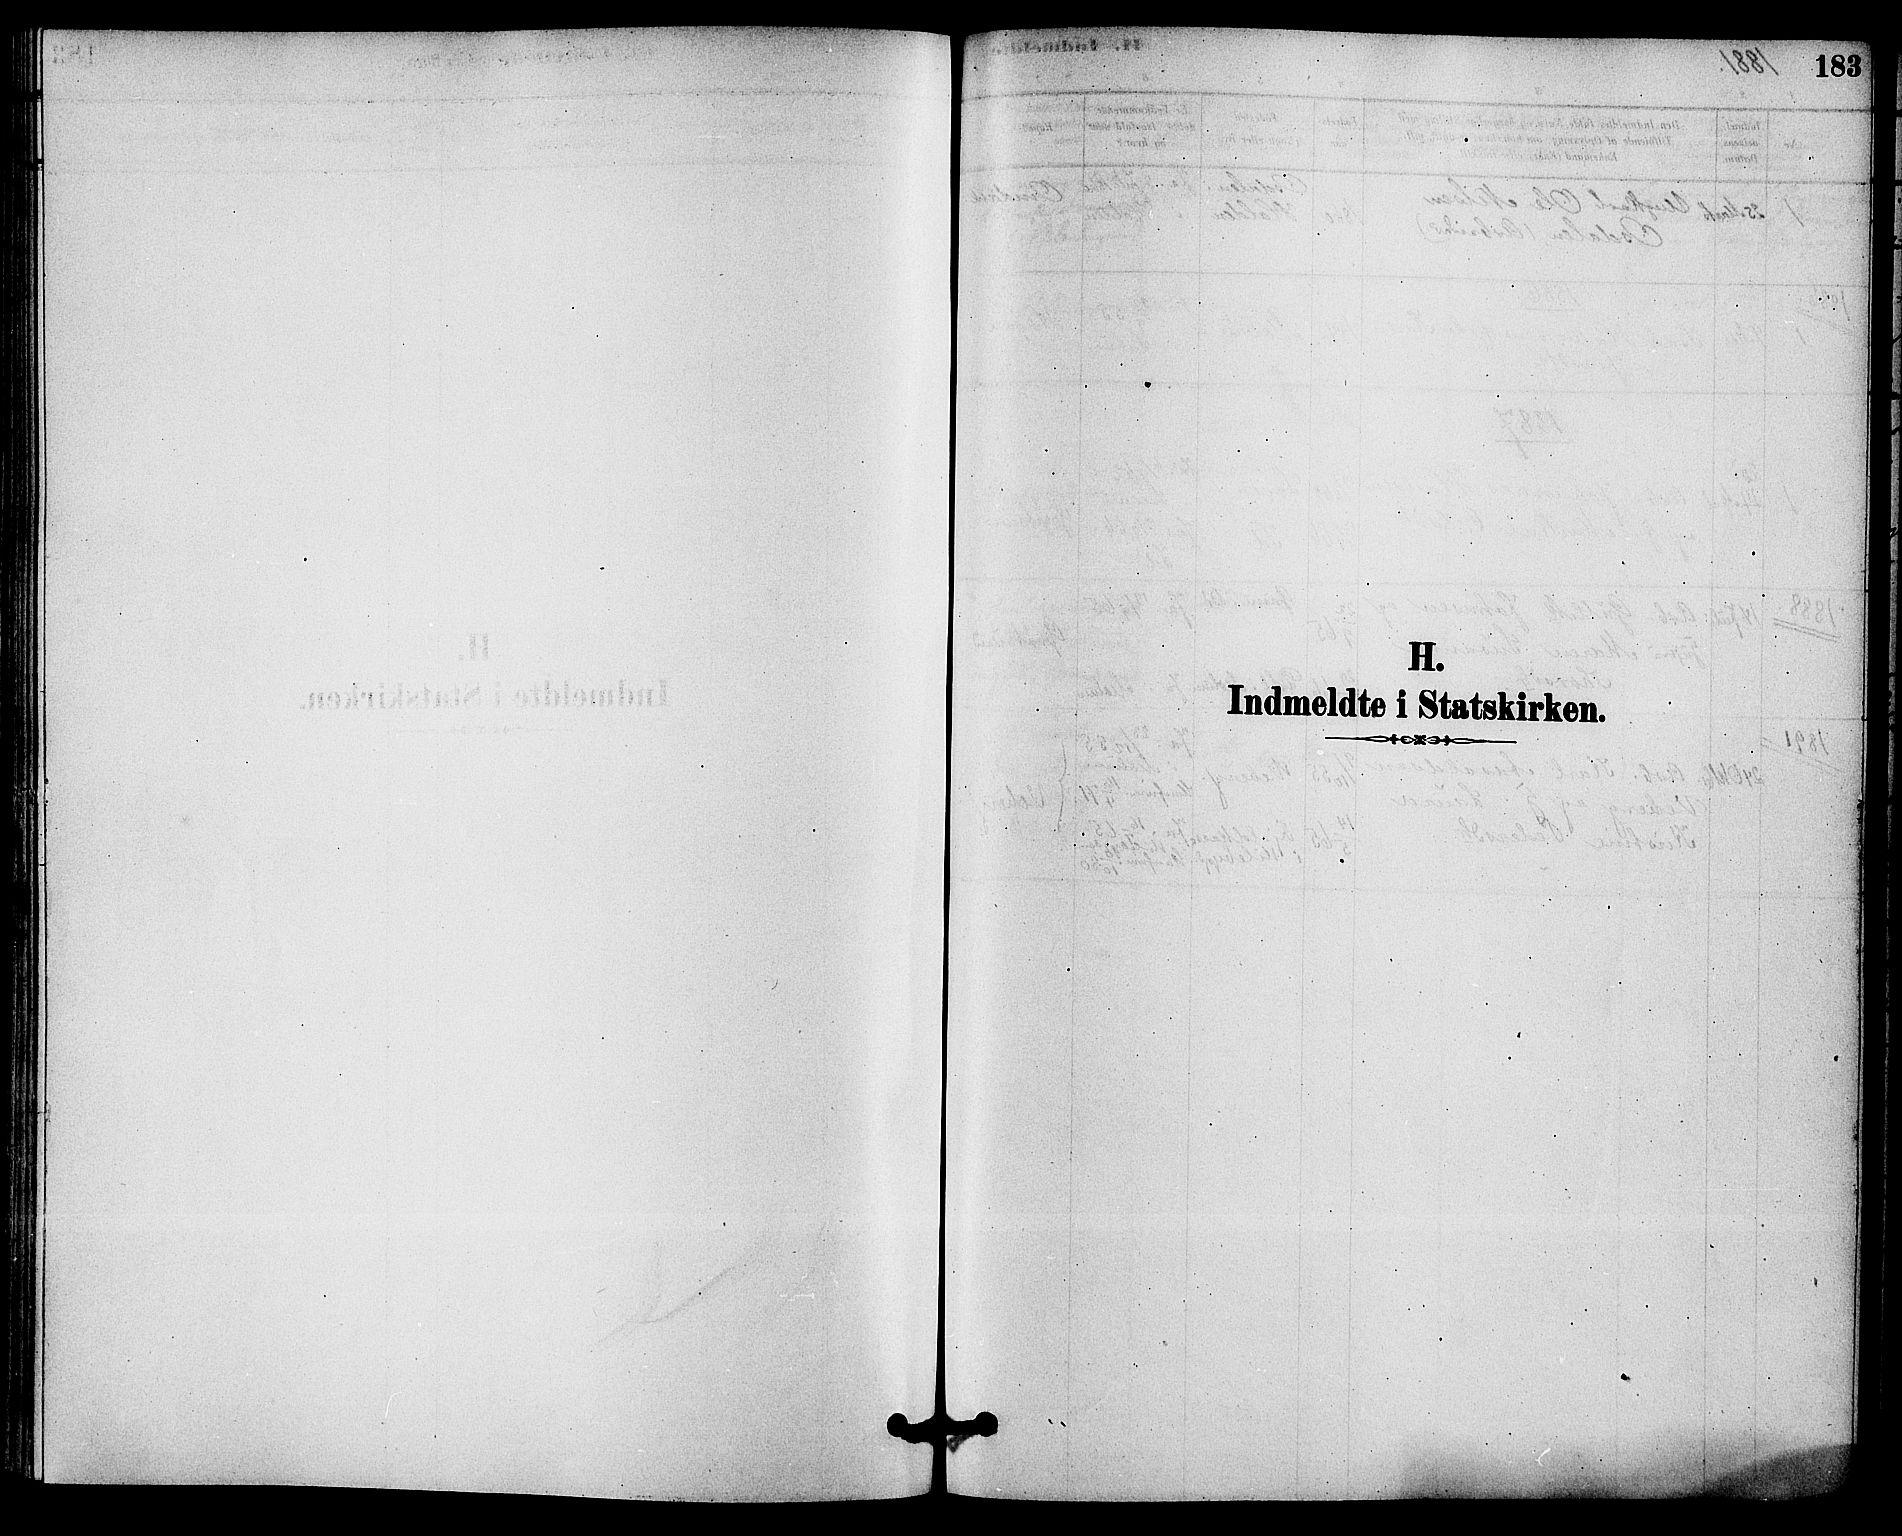 SAKO, Solum kirkebøker, F/Fb/L0001: Ministerialbok nr. II 1, 1877-1892, s. 183